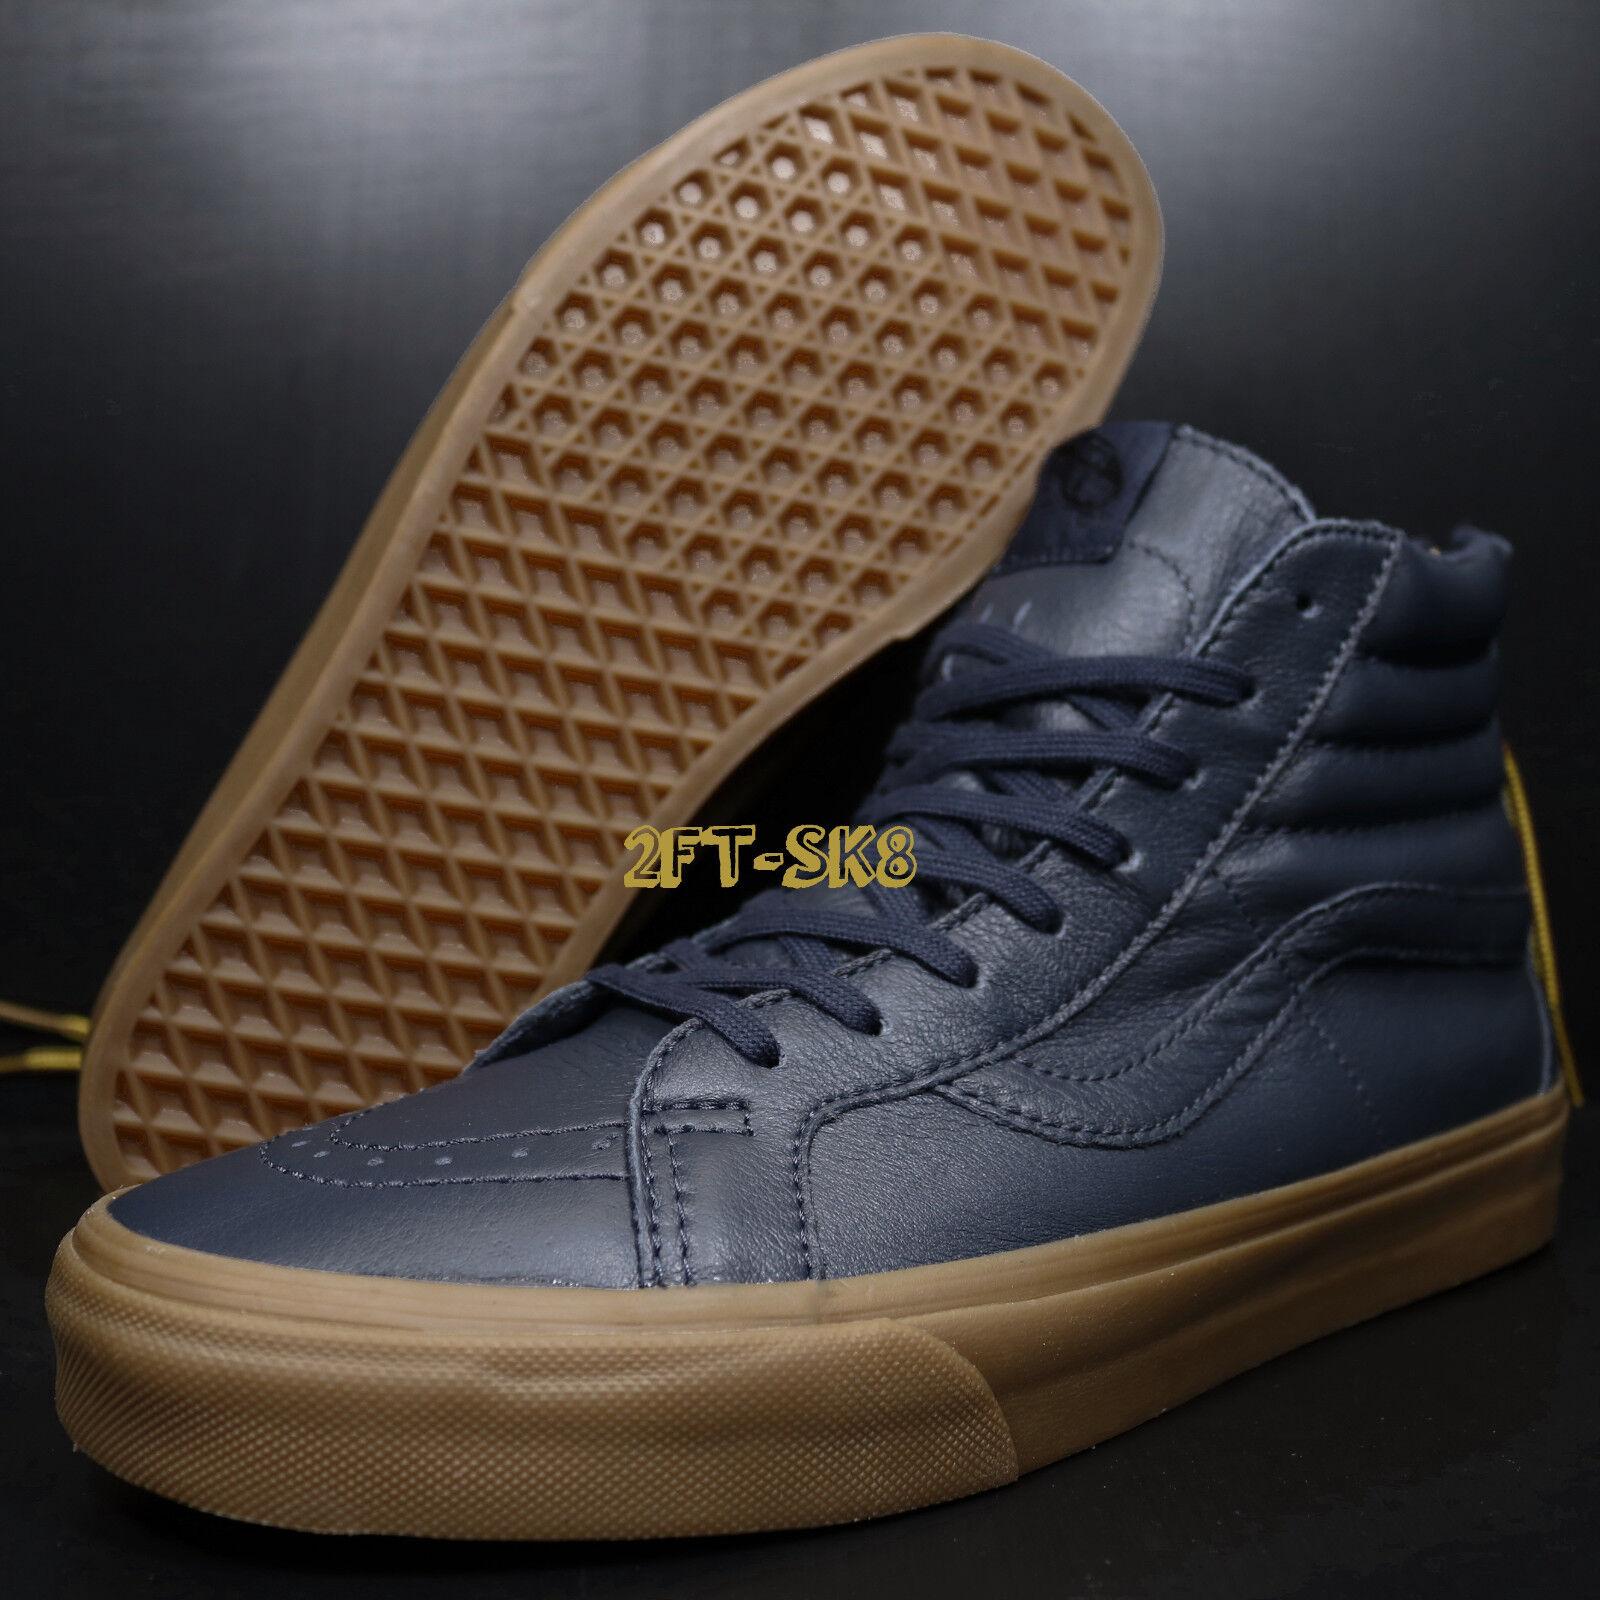 129752953bde0 VANS SK8-HI ZIP HIKING NAVY GUM MEN'S HIKING SHOES S8415.314  ncksaw712-Athletic Shoes